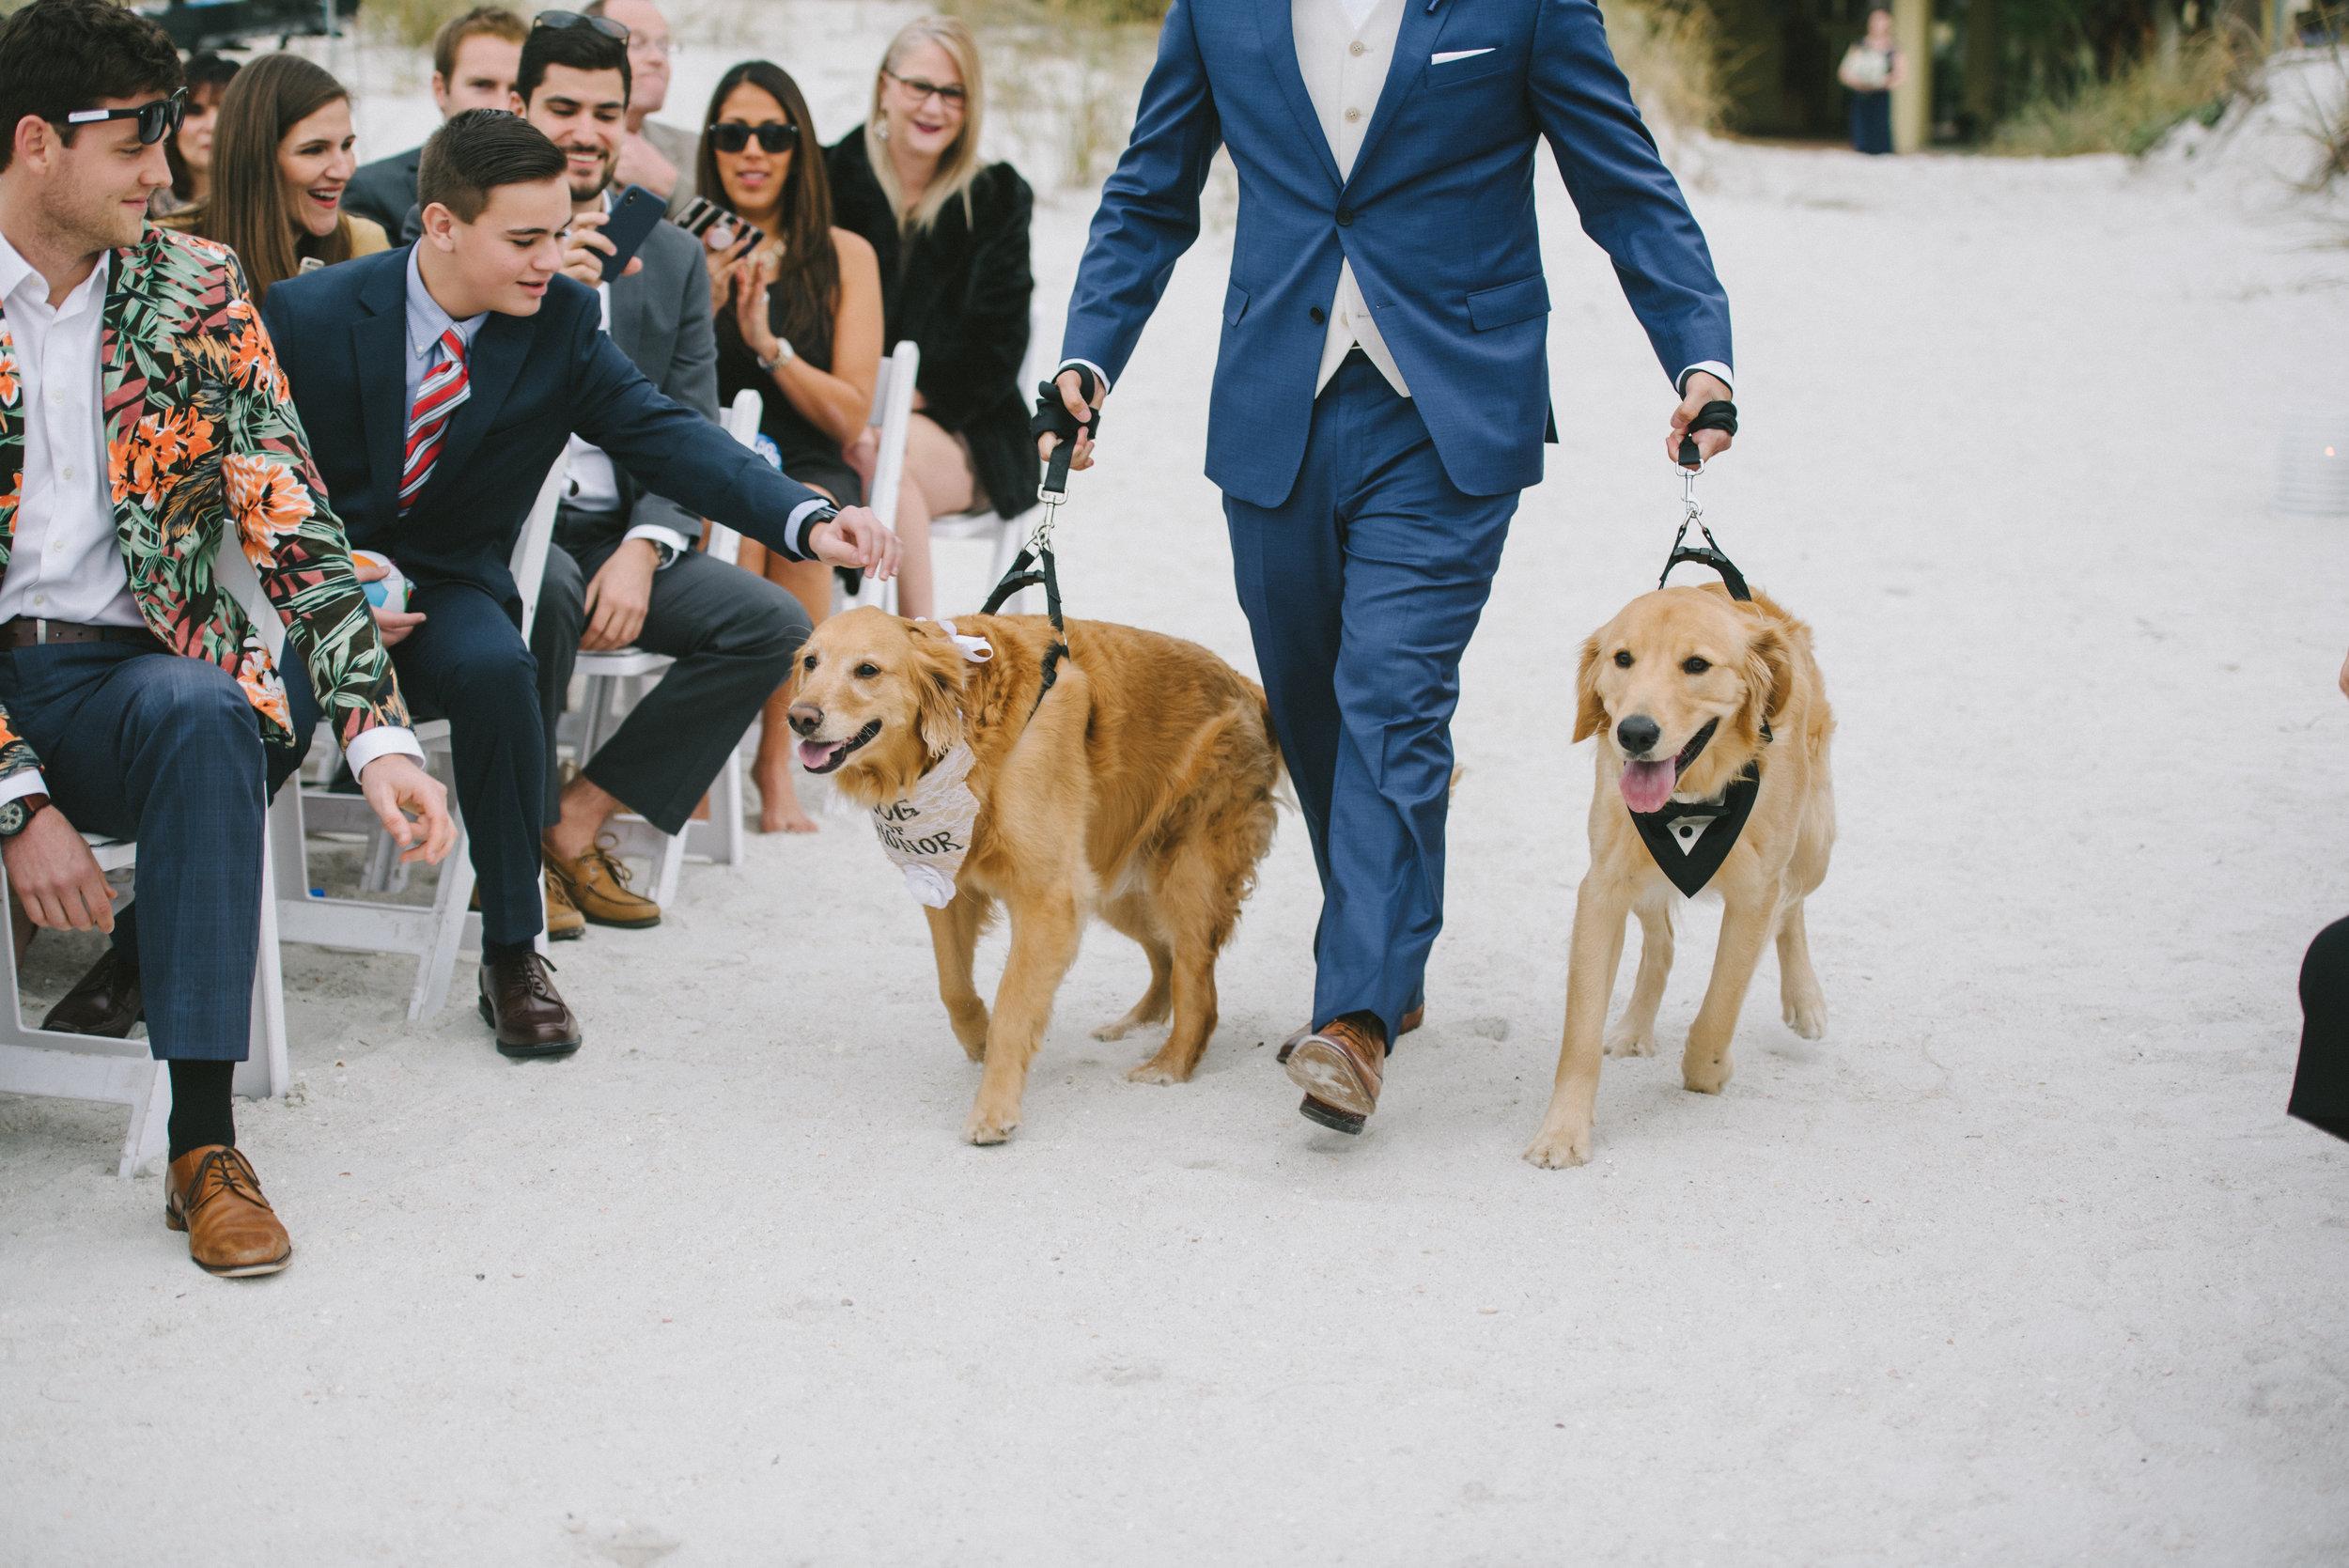 Photo by  Kéra Photography  at  Sirata Beach Resort  in St Pete Beach, FL